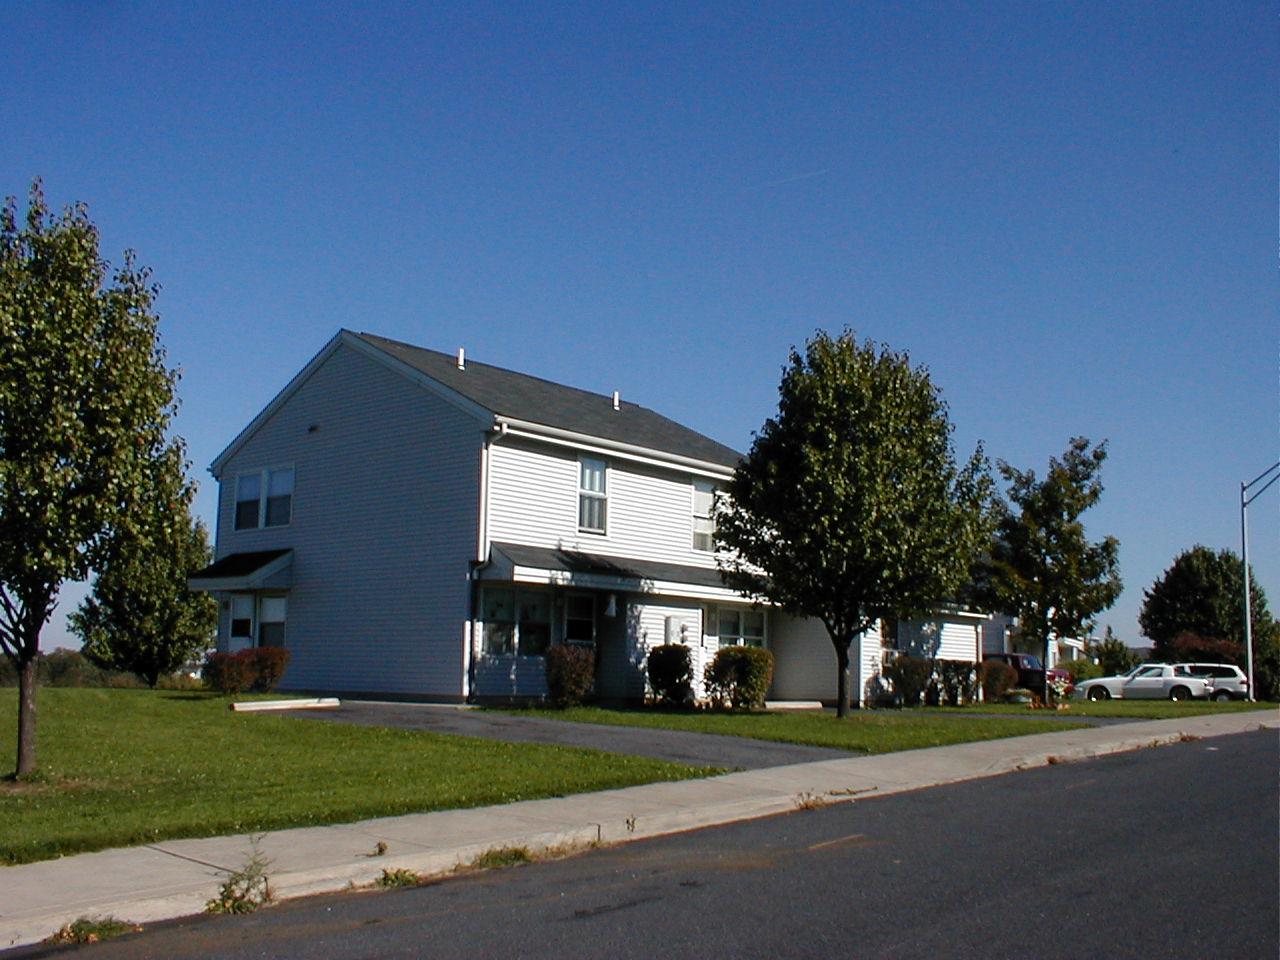 Image of Parkridge in Bethlehem, Pennsylvania